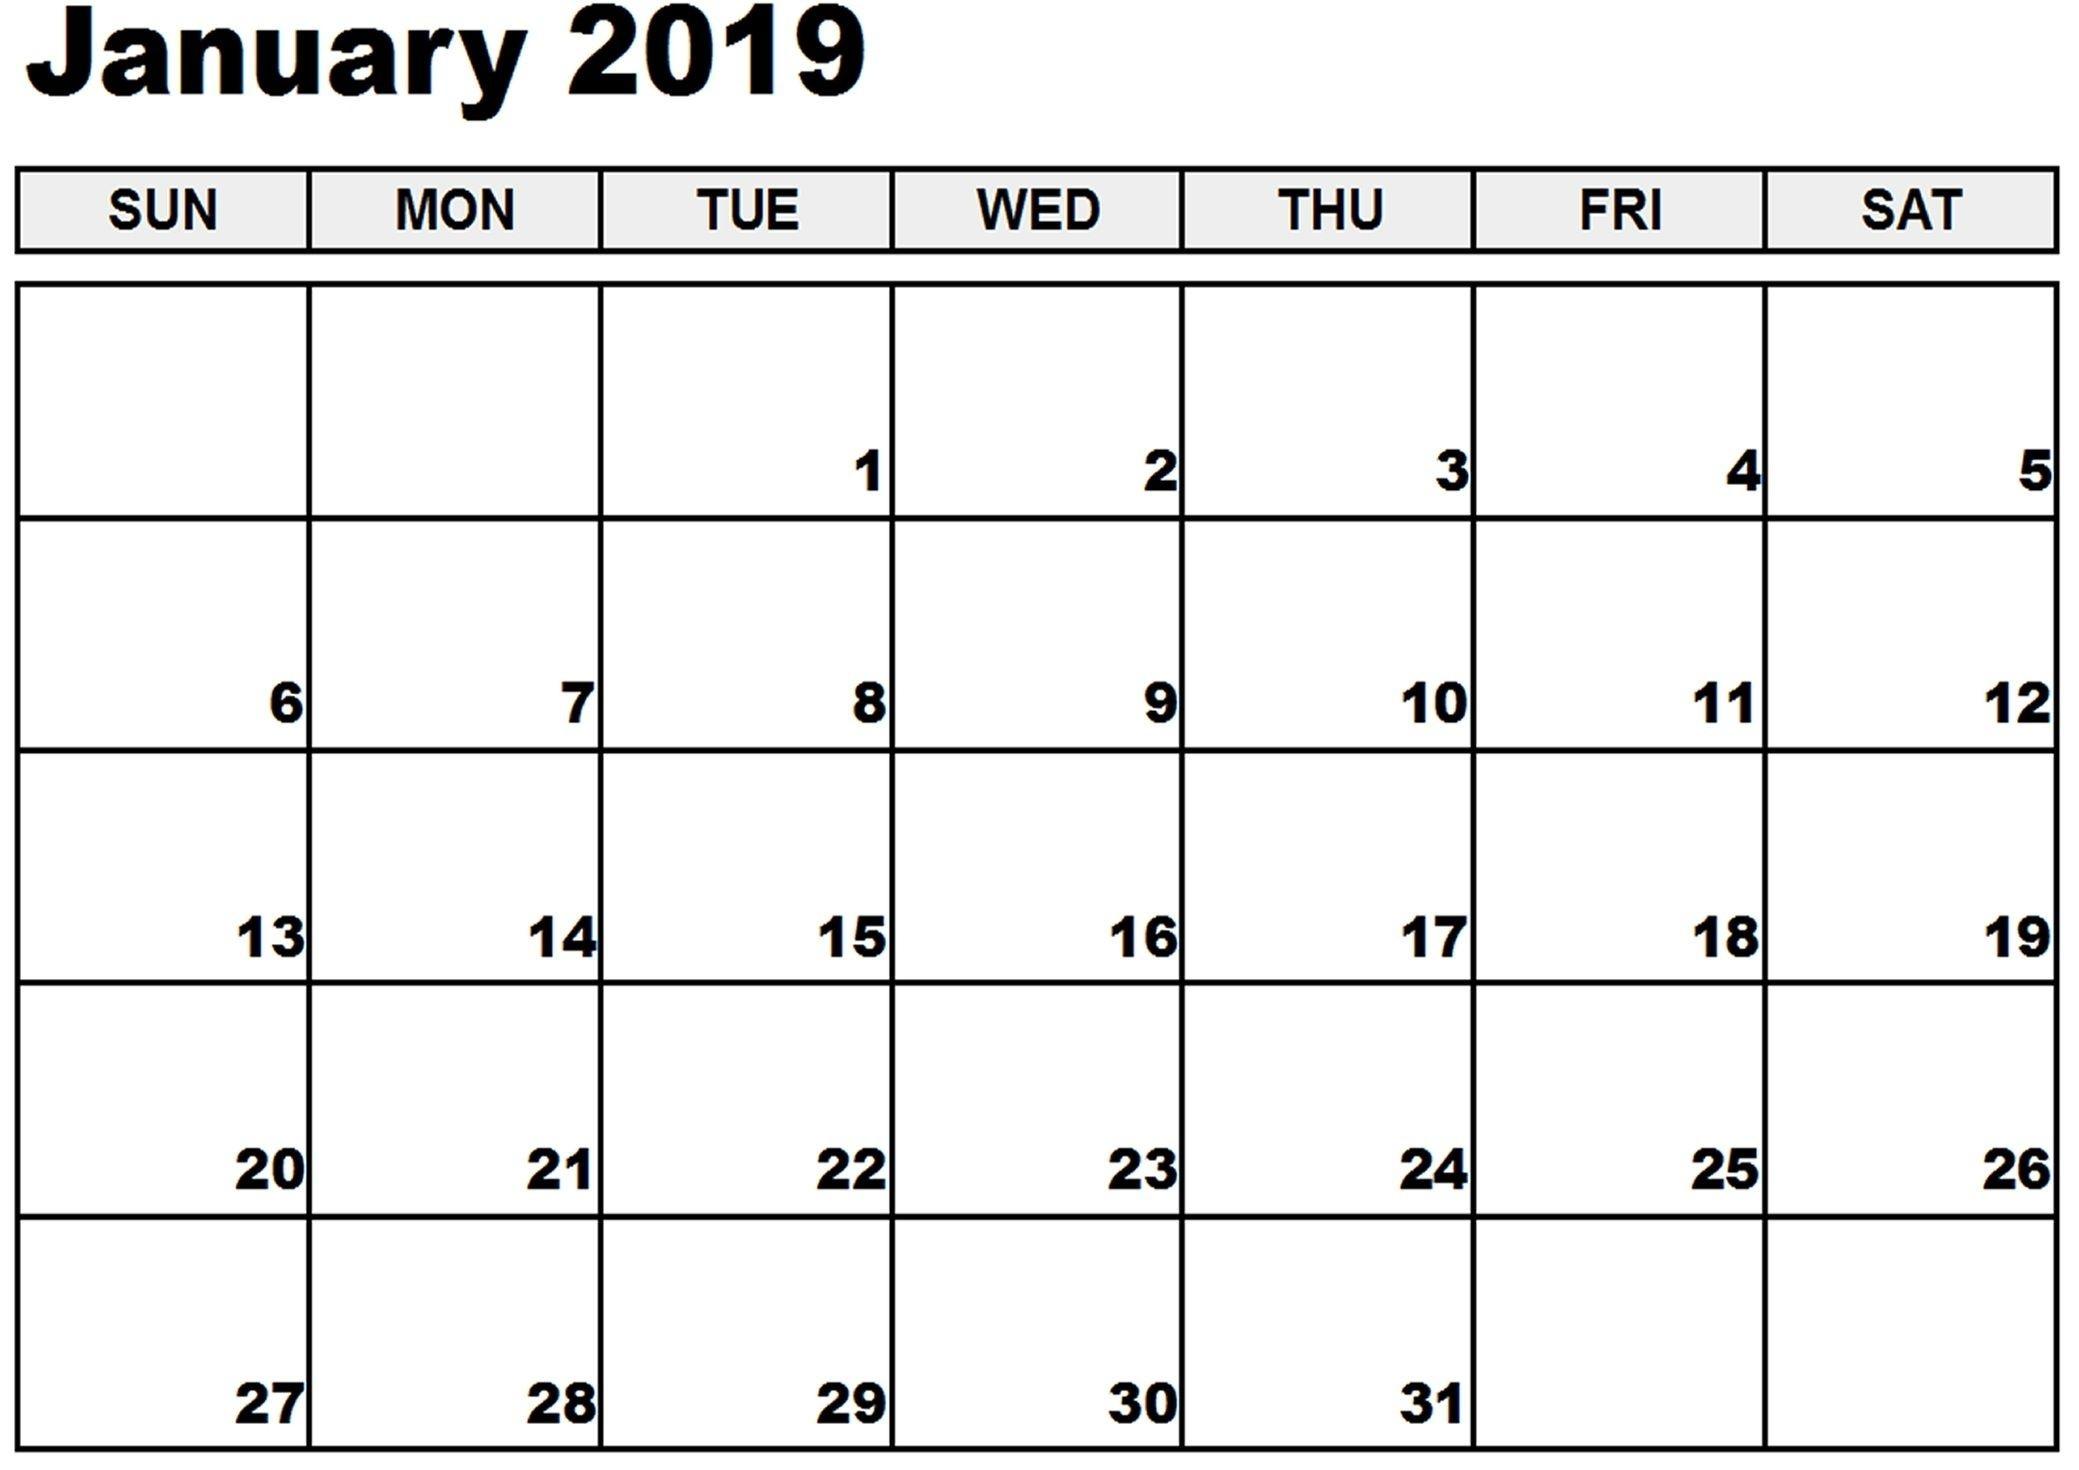 January 2019 Printable Calendar January 2019 Calendar-Monthly Calendar Uk Printable